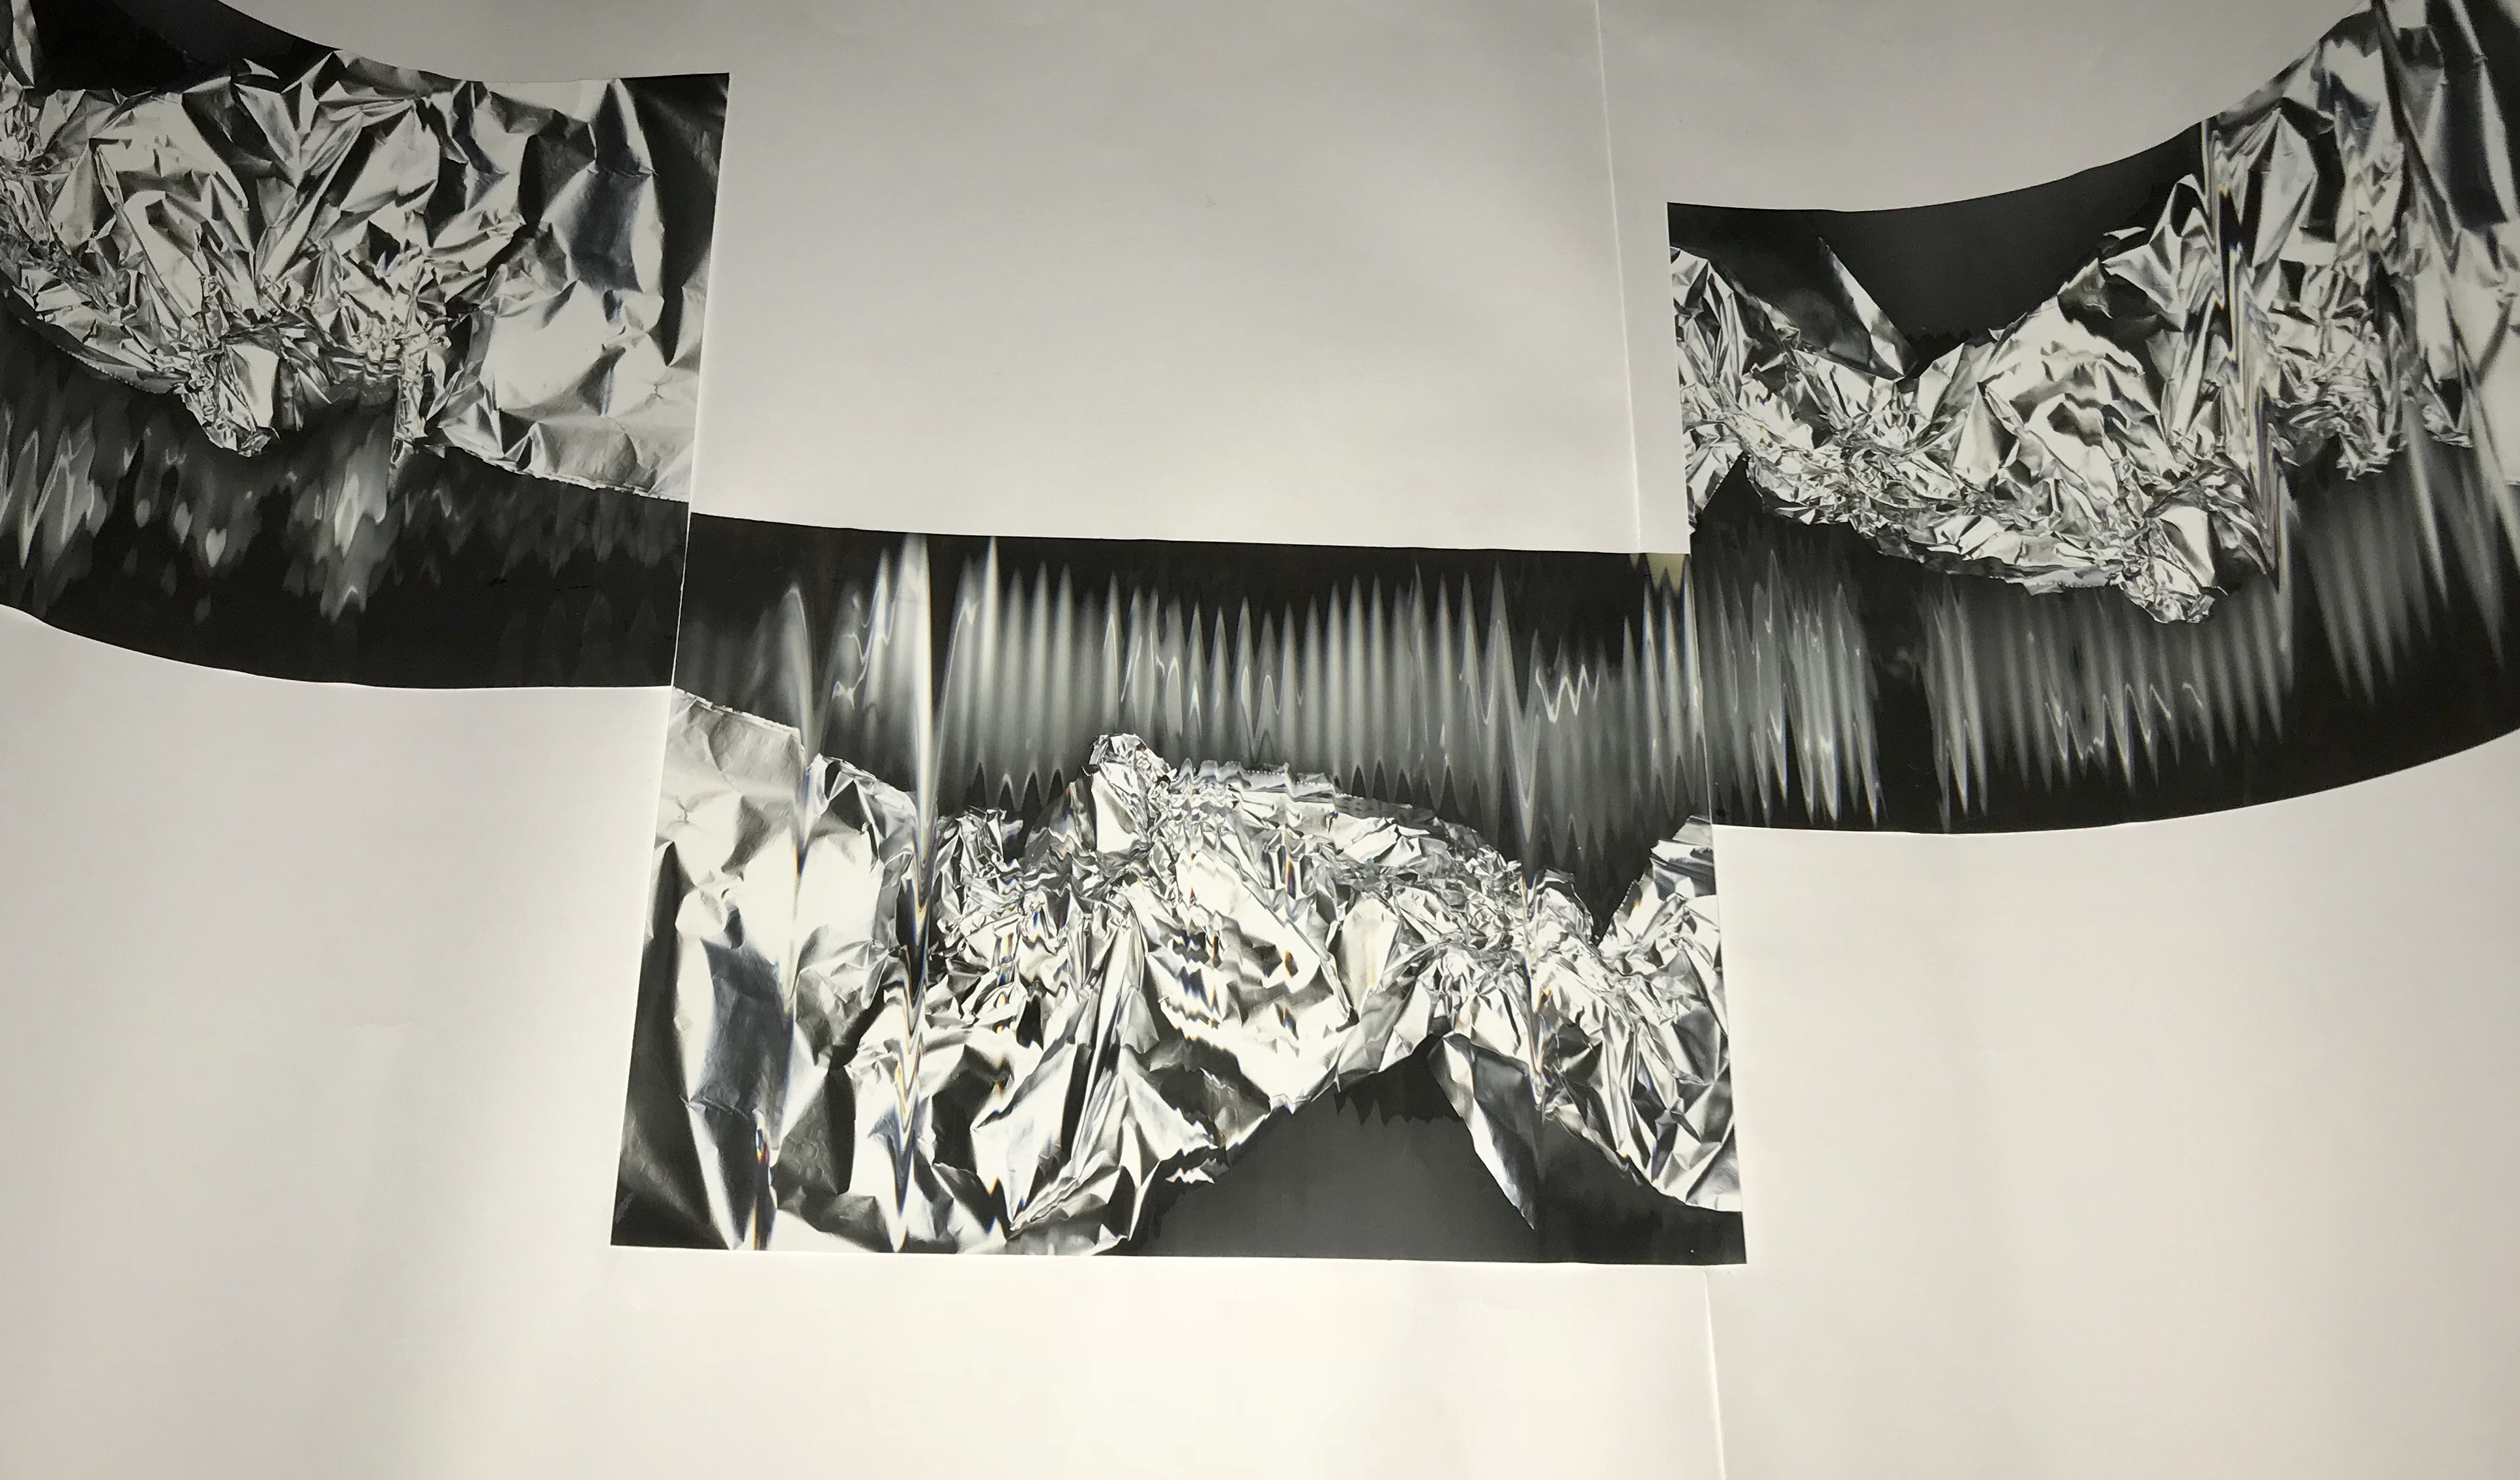 Scanography (Triptych)